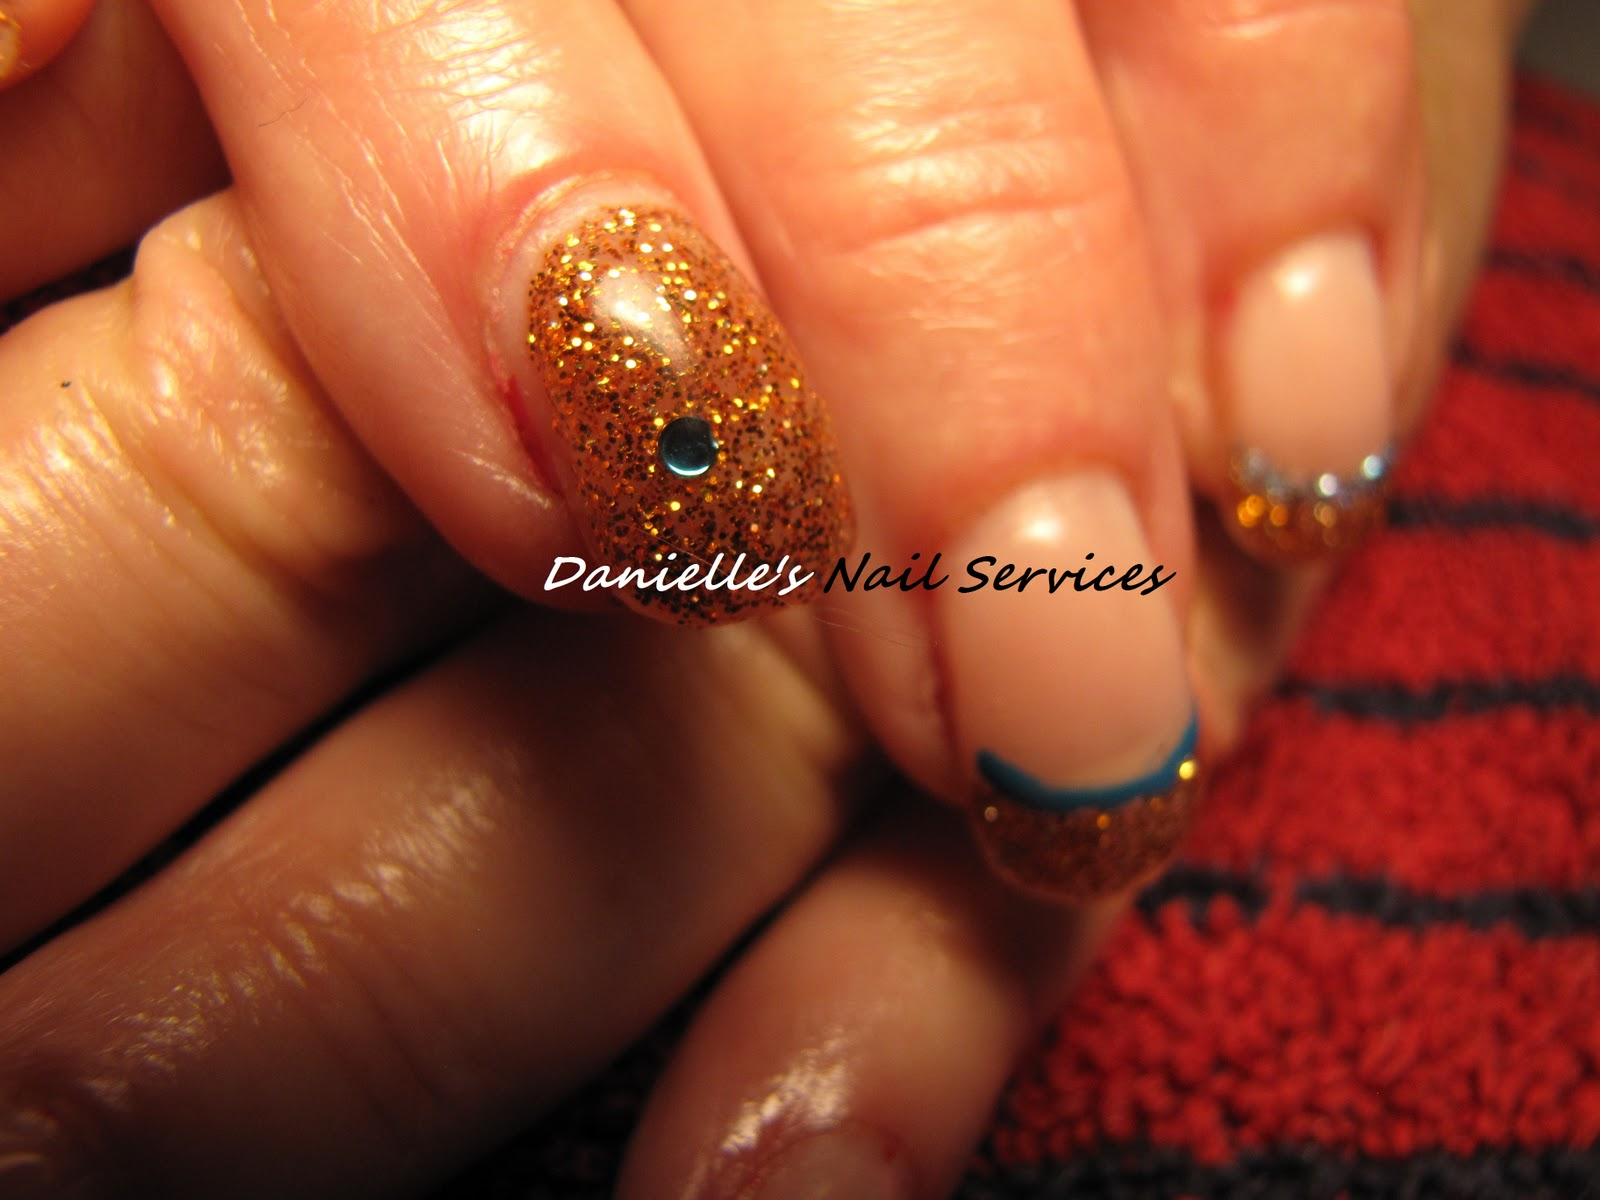 Danielle's Nail Services: December 29th, 2011 - Flashy ...